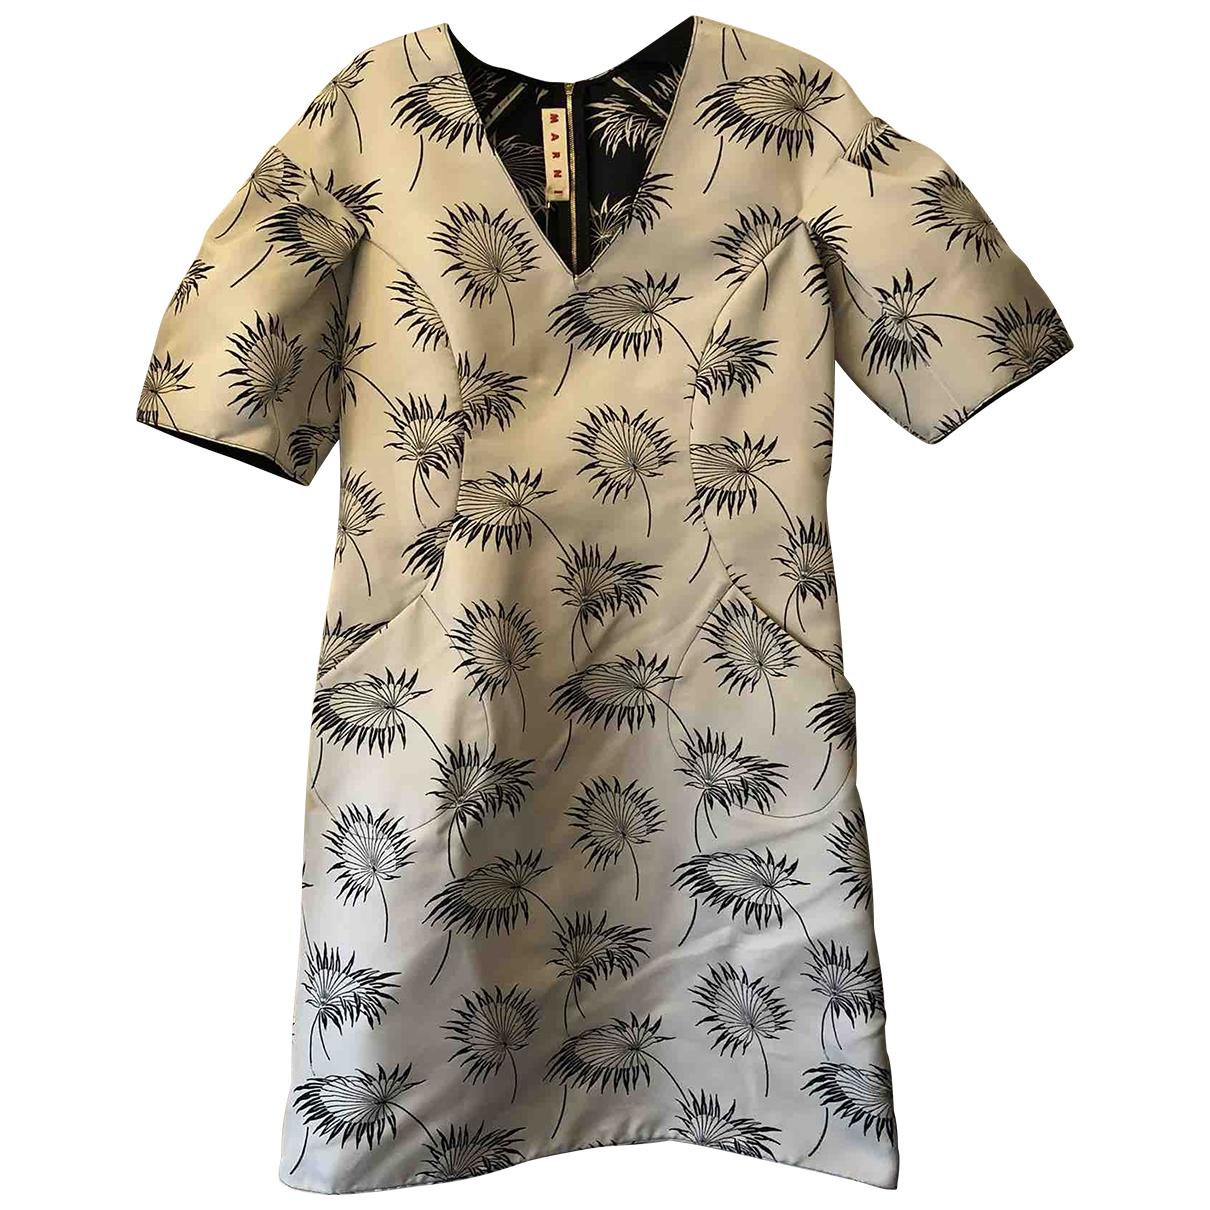 Marni \N Kleid in  Anthrazit Polyester